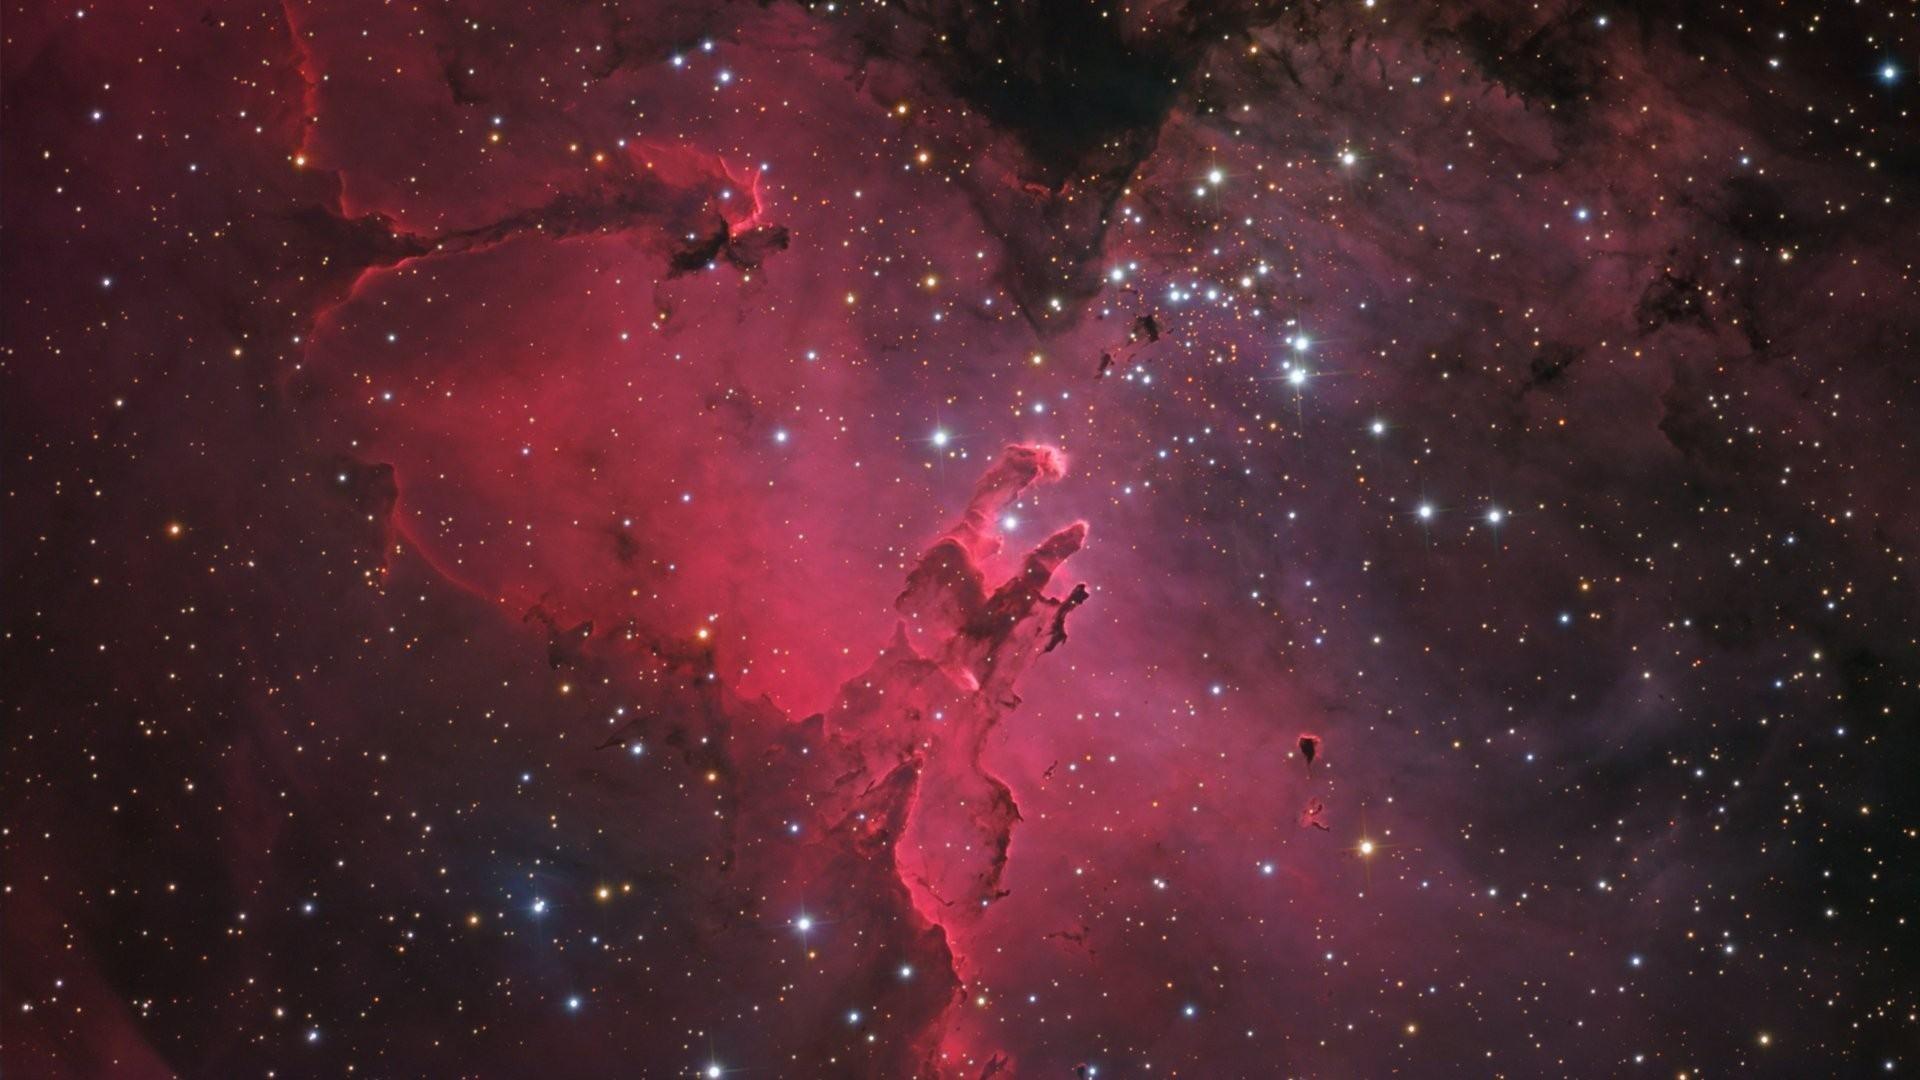 NASA Hubble Images High Re.